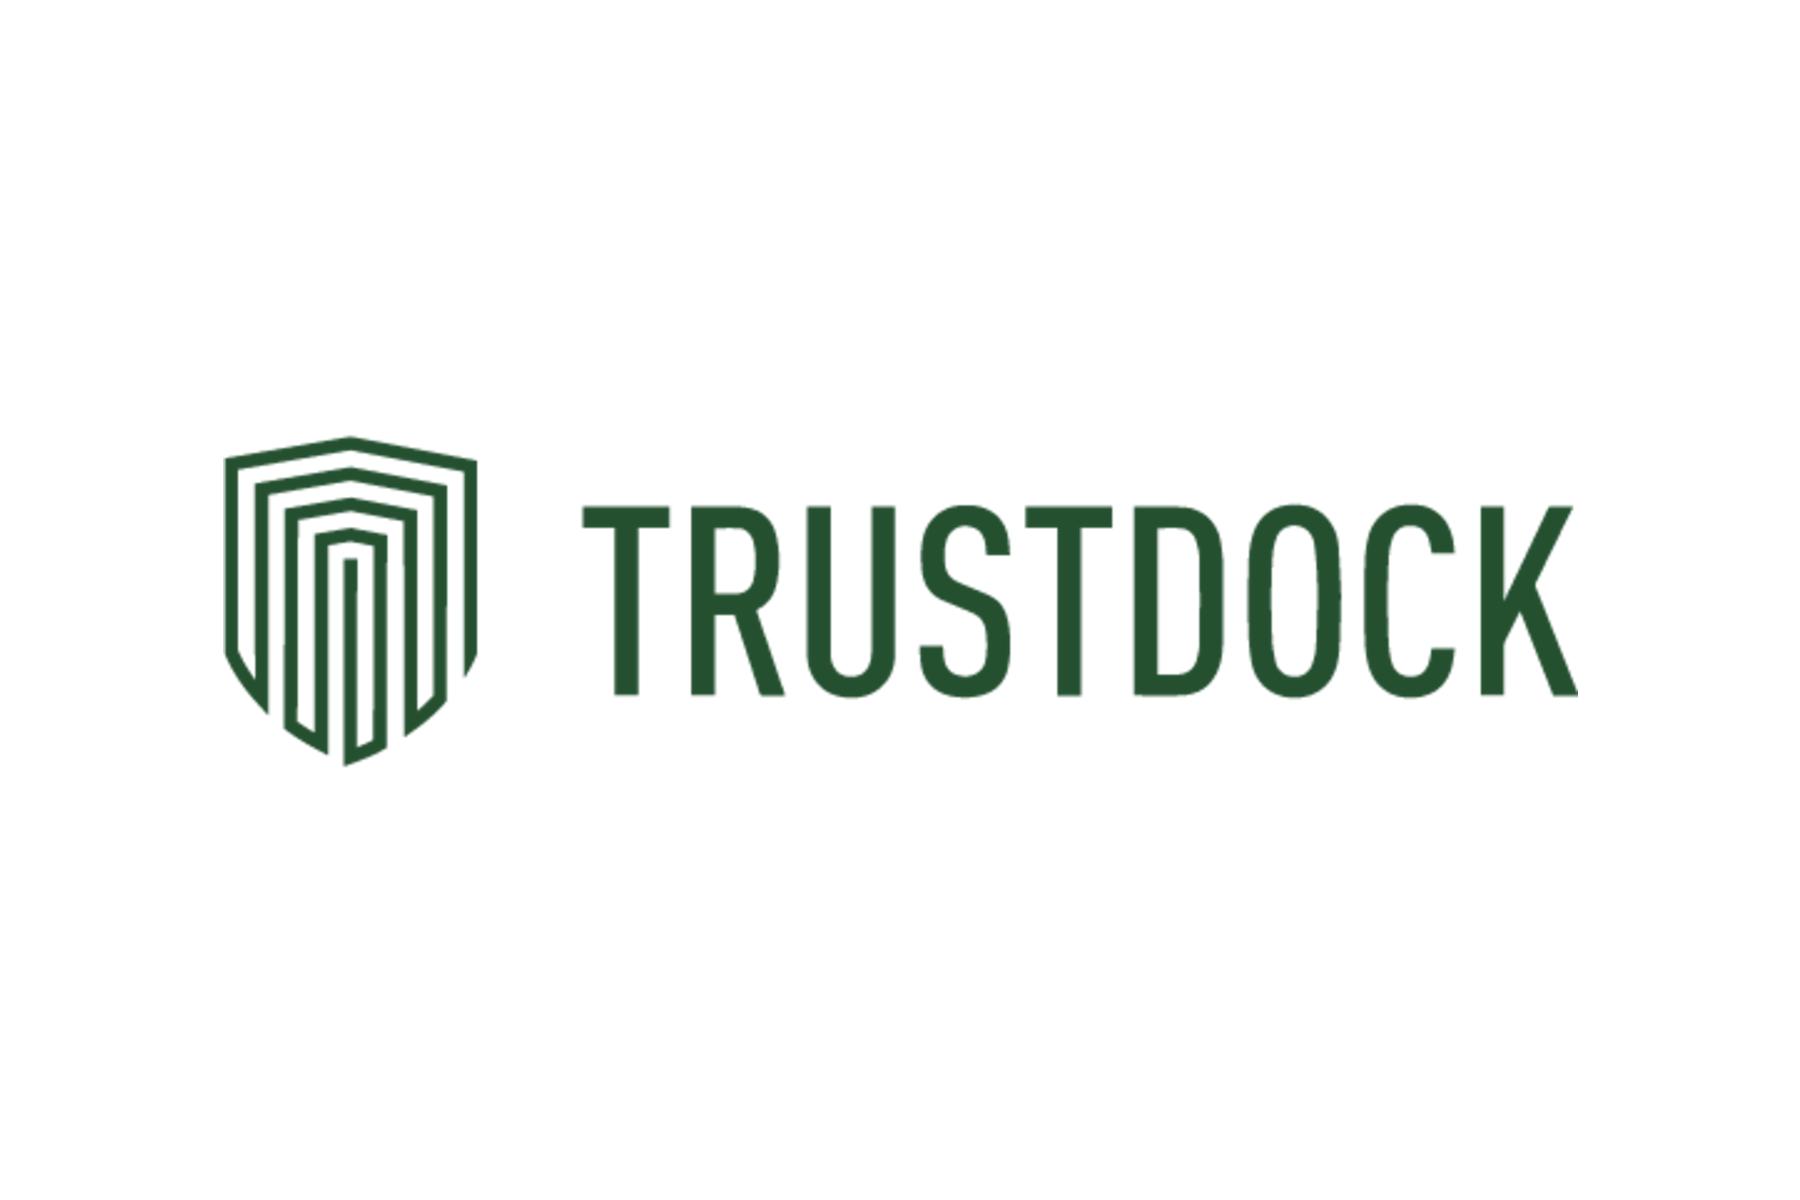 TRUSTDOCK、福岡市実証実験フルサポート事業において、『デジタル身分証による行政手続き』の実証実験プロジェクトが採択